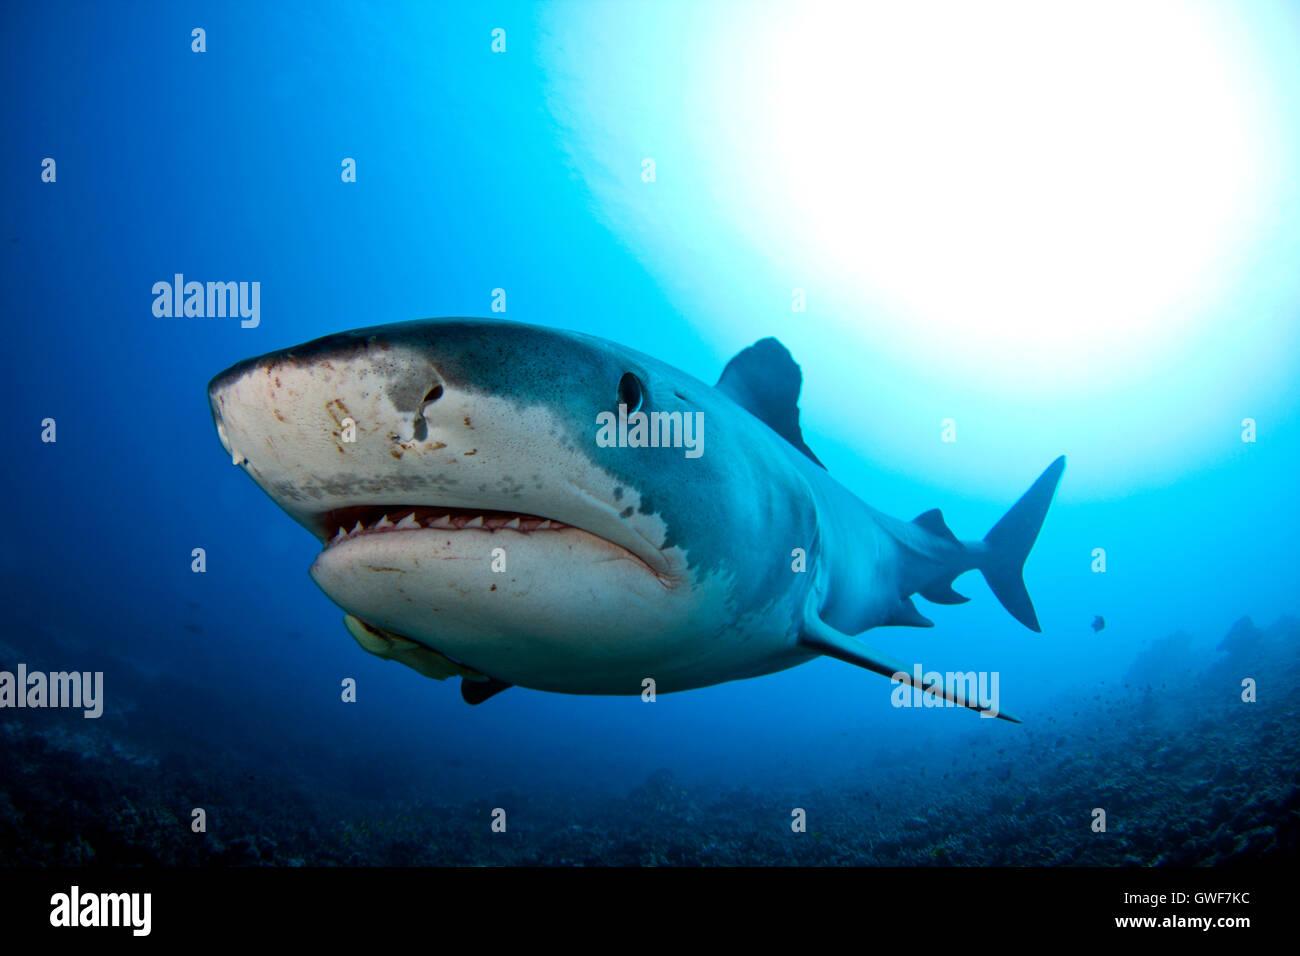 A tiger shark swims over the reef at Kona, Hawaii - Stock Image